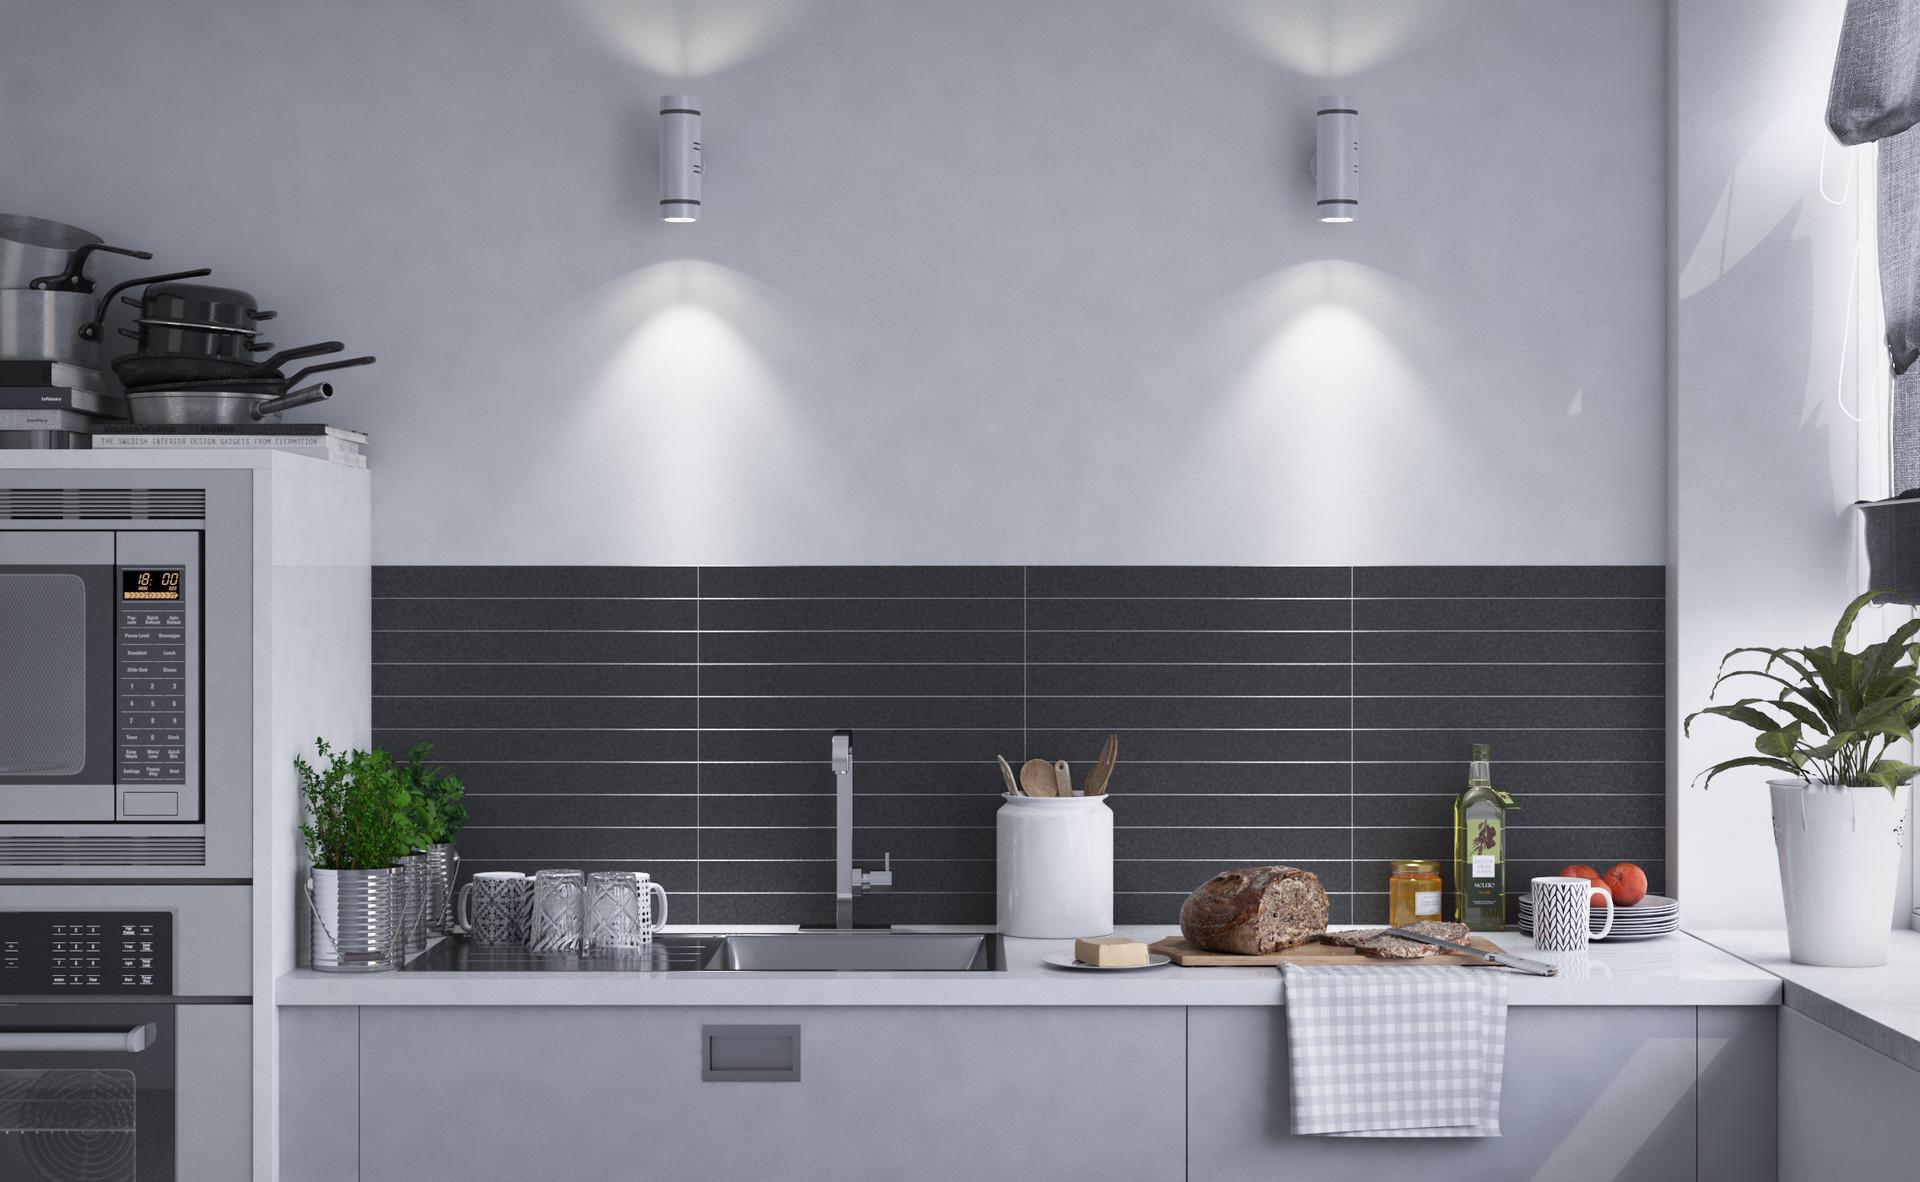 Francois bethermin grey kitchen